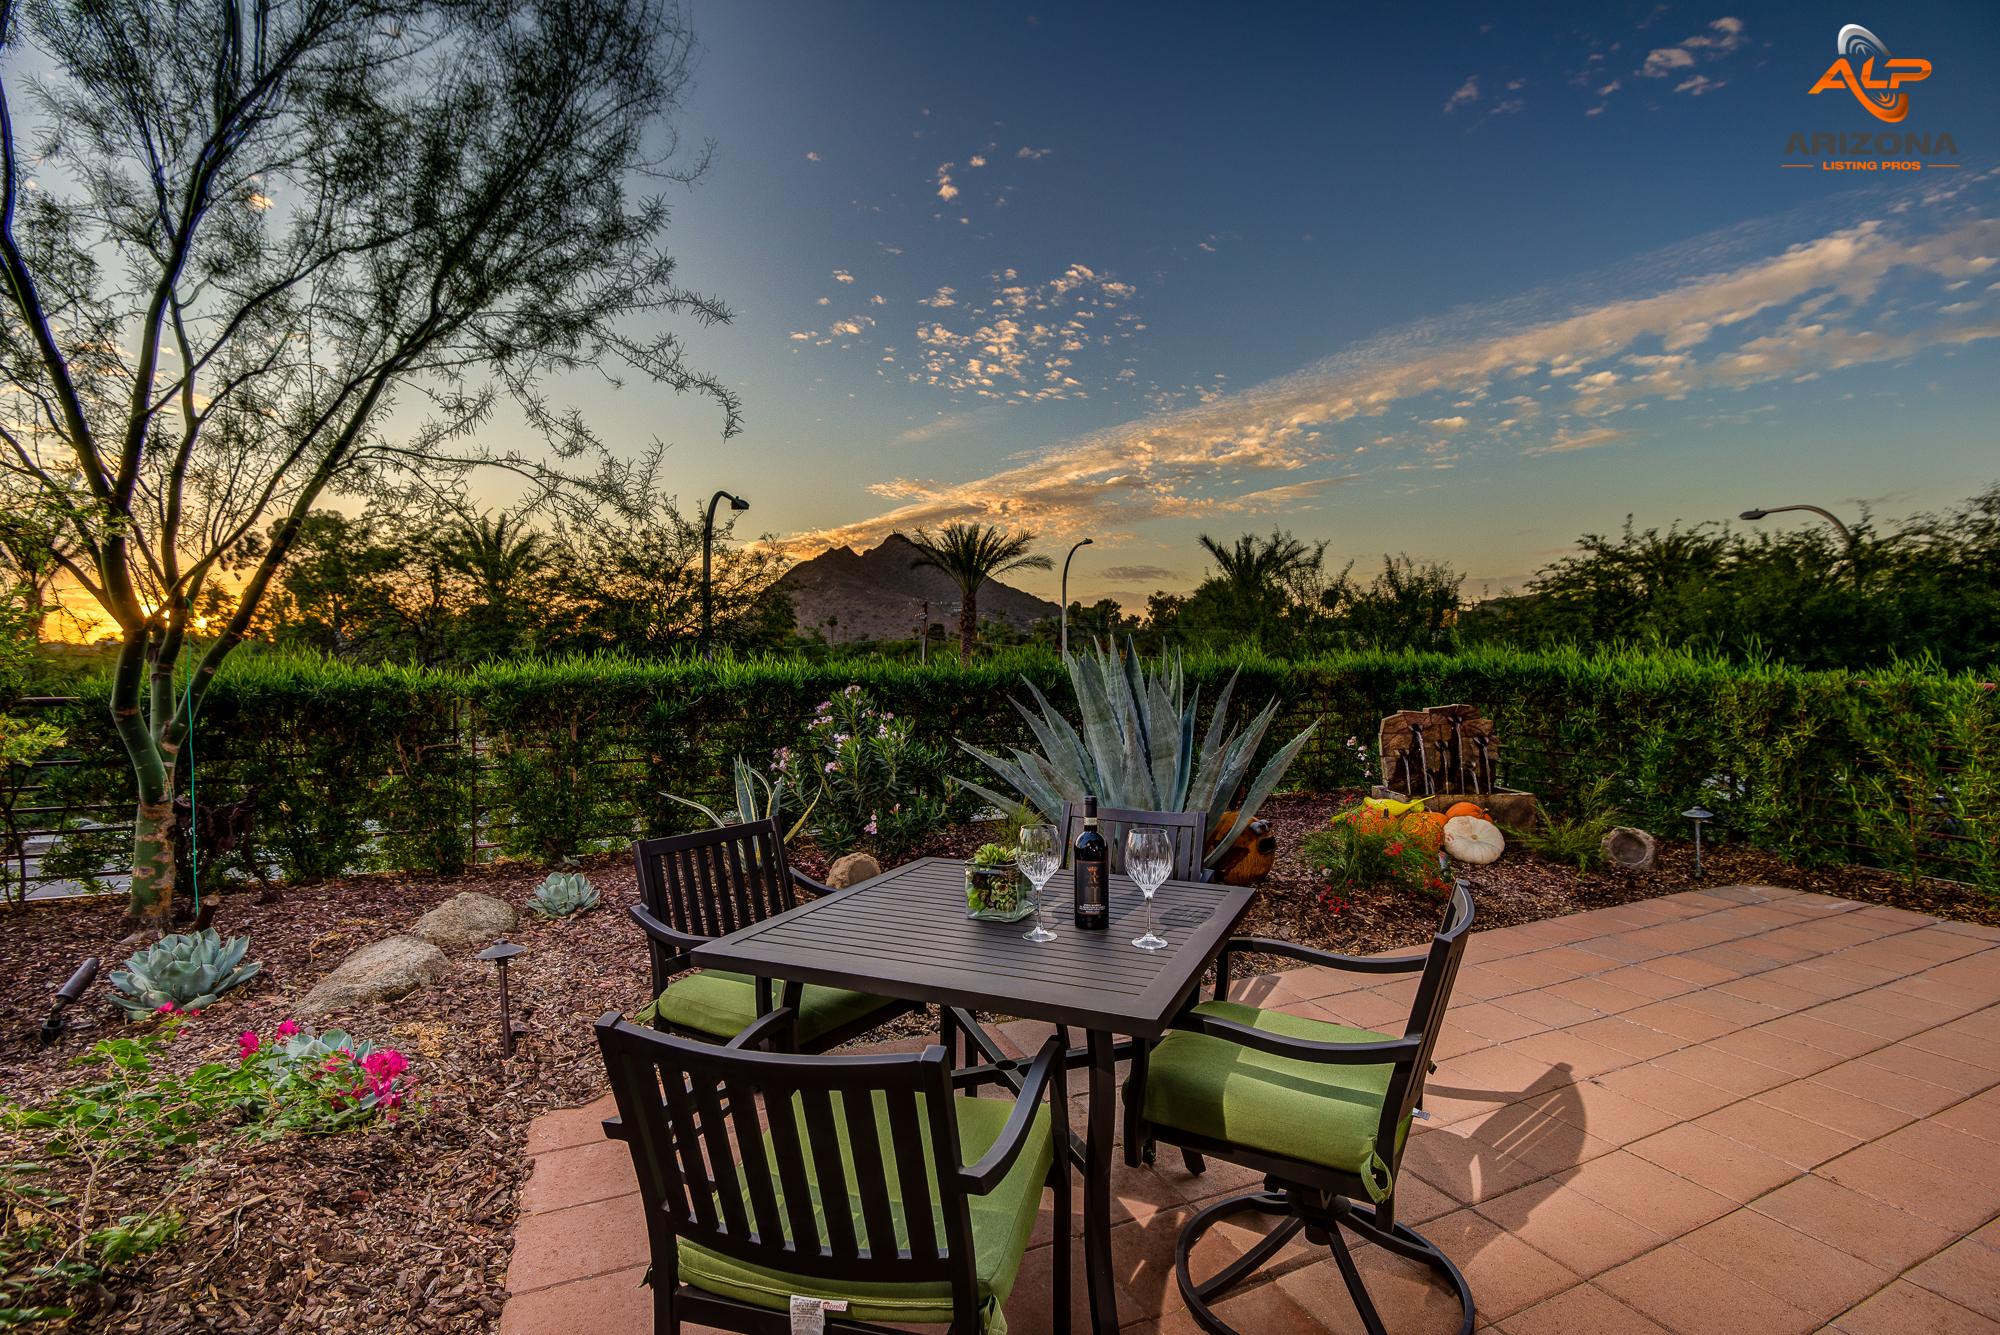 Luxury Photography, Optima Camelview Village, 7117 East Rancho Vista Drive, Unit 3002, Scottsdale, AZ, November 1st, 2017.jpg